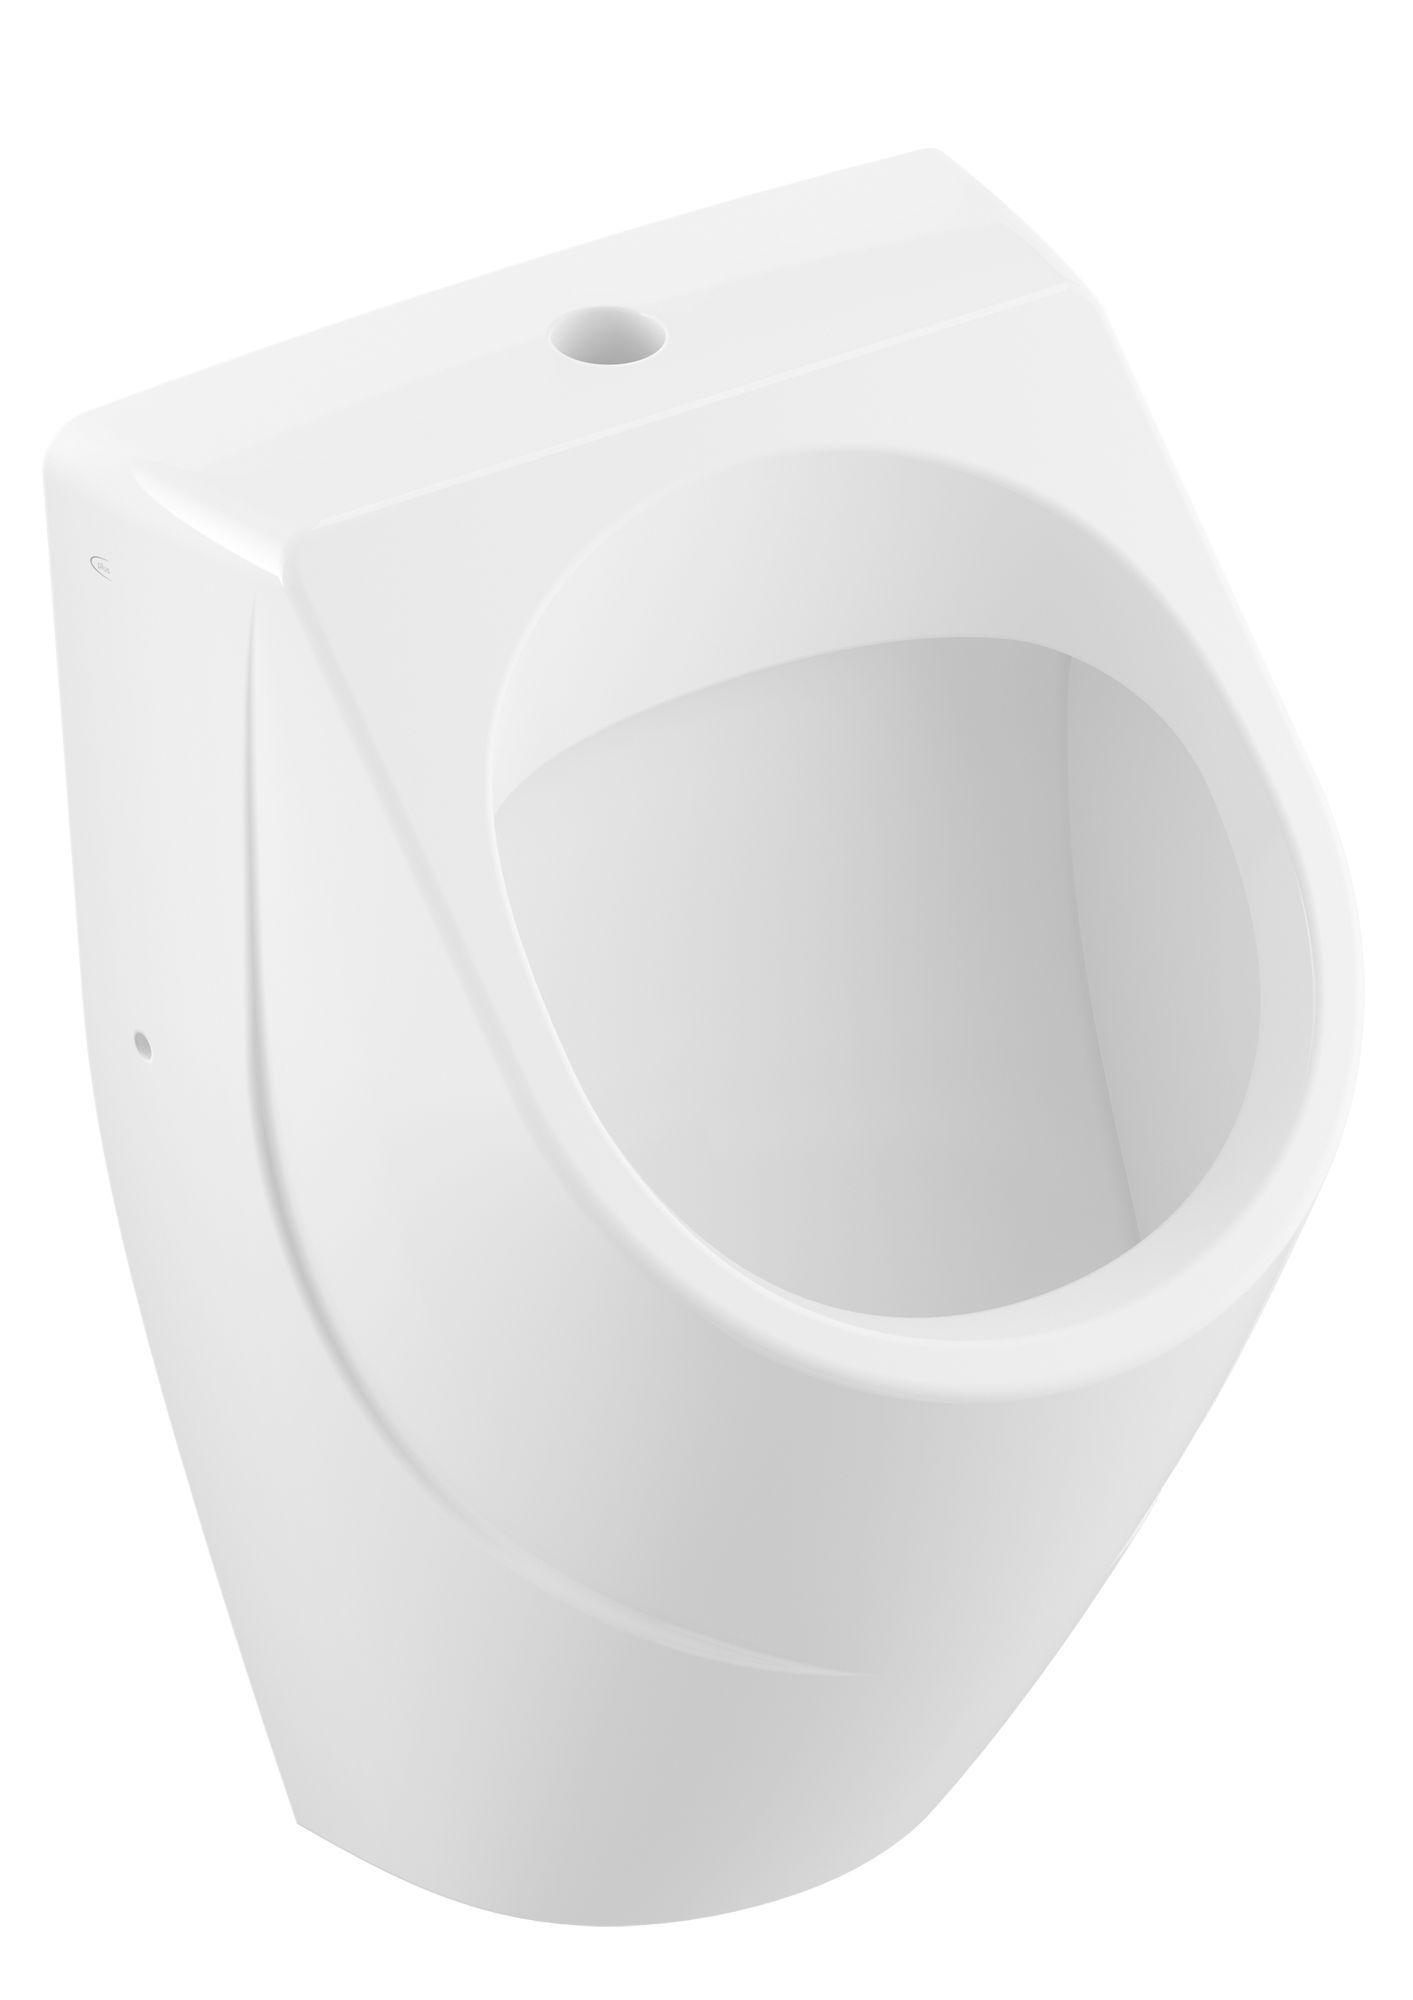 Villeroy & Boch O.novo Absaug-Urinal spülrandlos DirectFlush B:33,5xH:56xT:32cm weiß Ceramicplus 752300R1